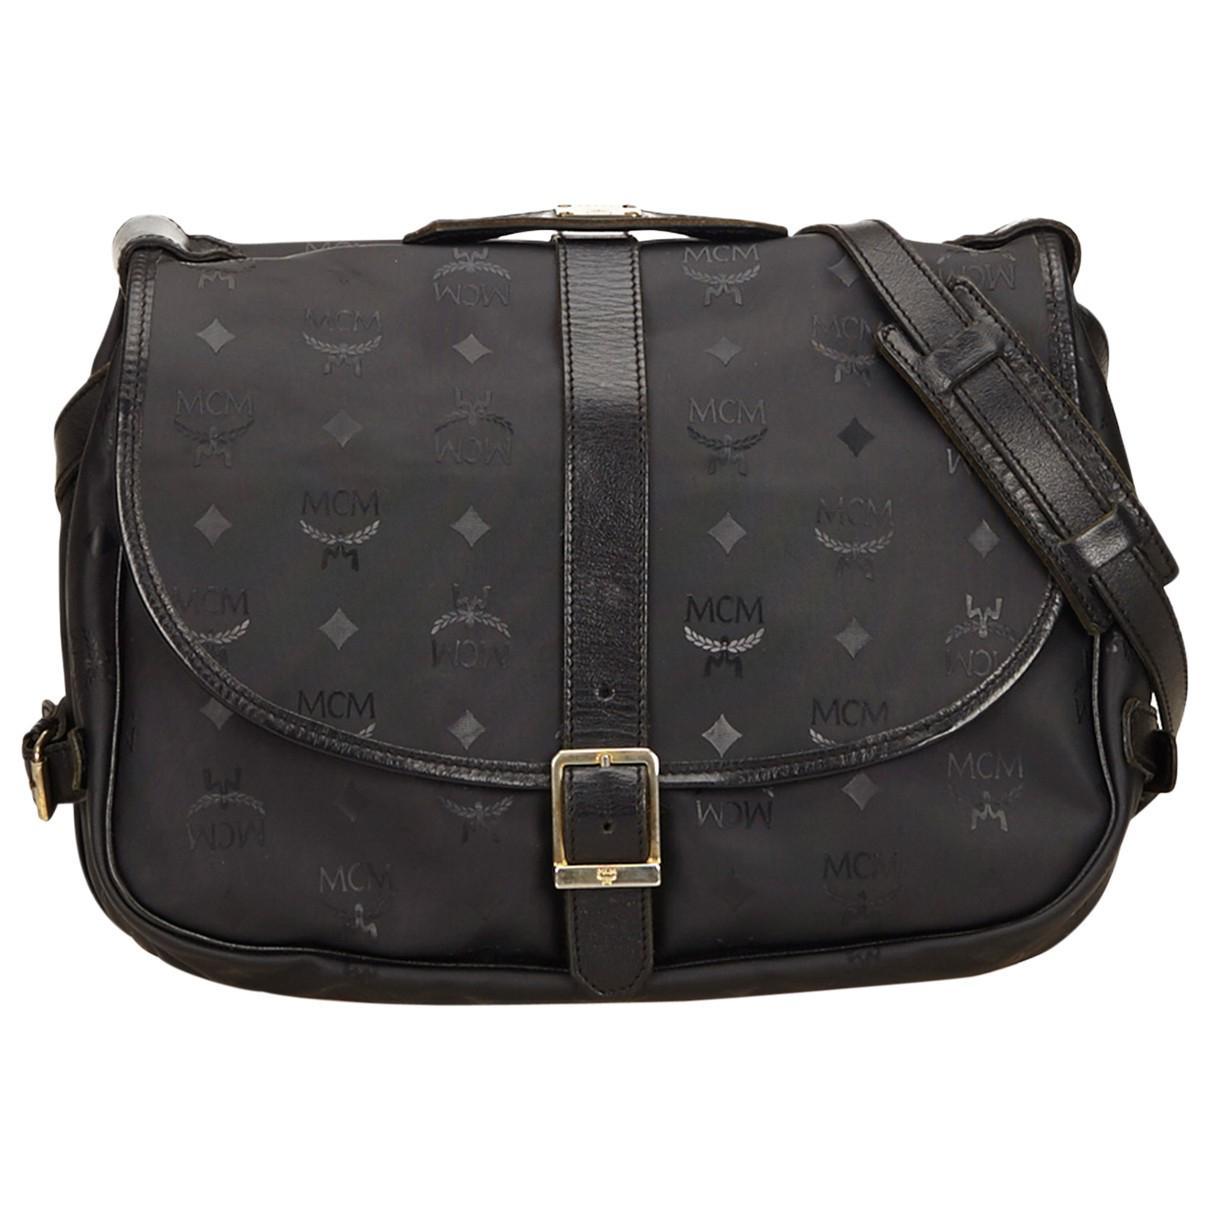 2174969e543f MCM Pre-owned Vintage Black Plastic Handbags in Black - Lyst